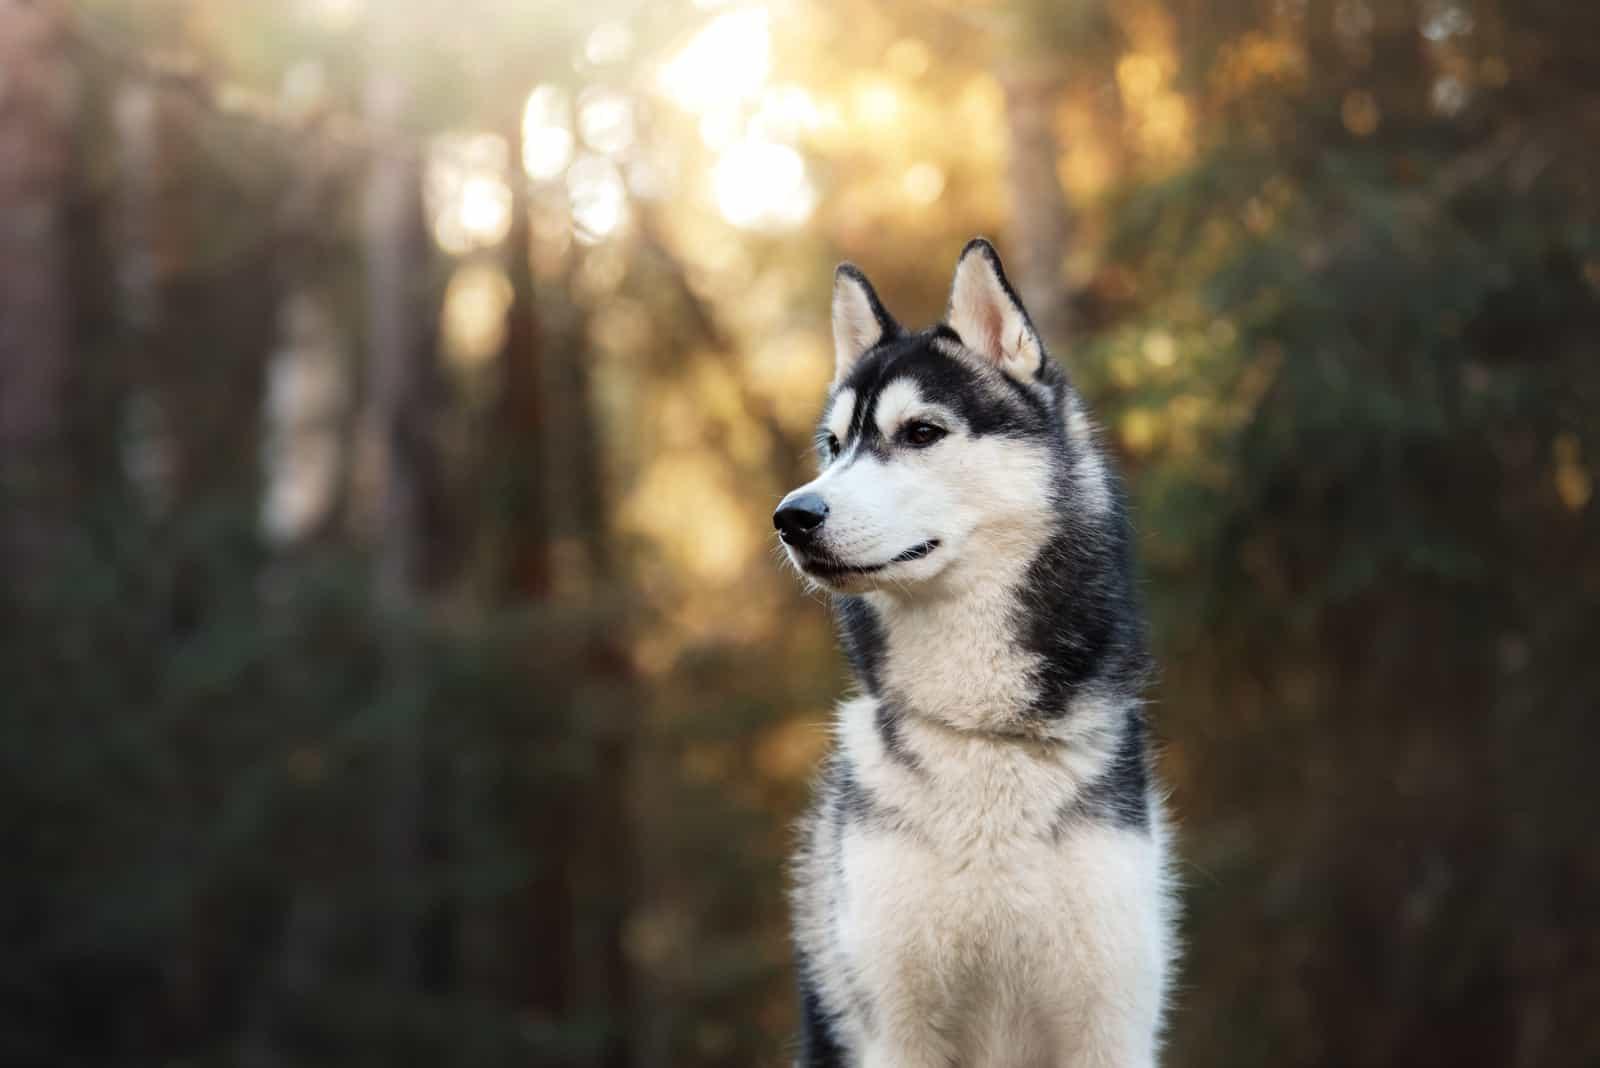 Siberian Husky standing in forest